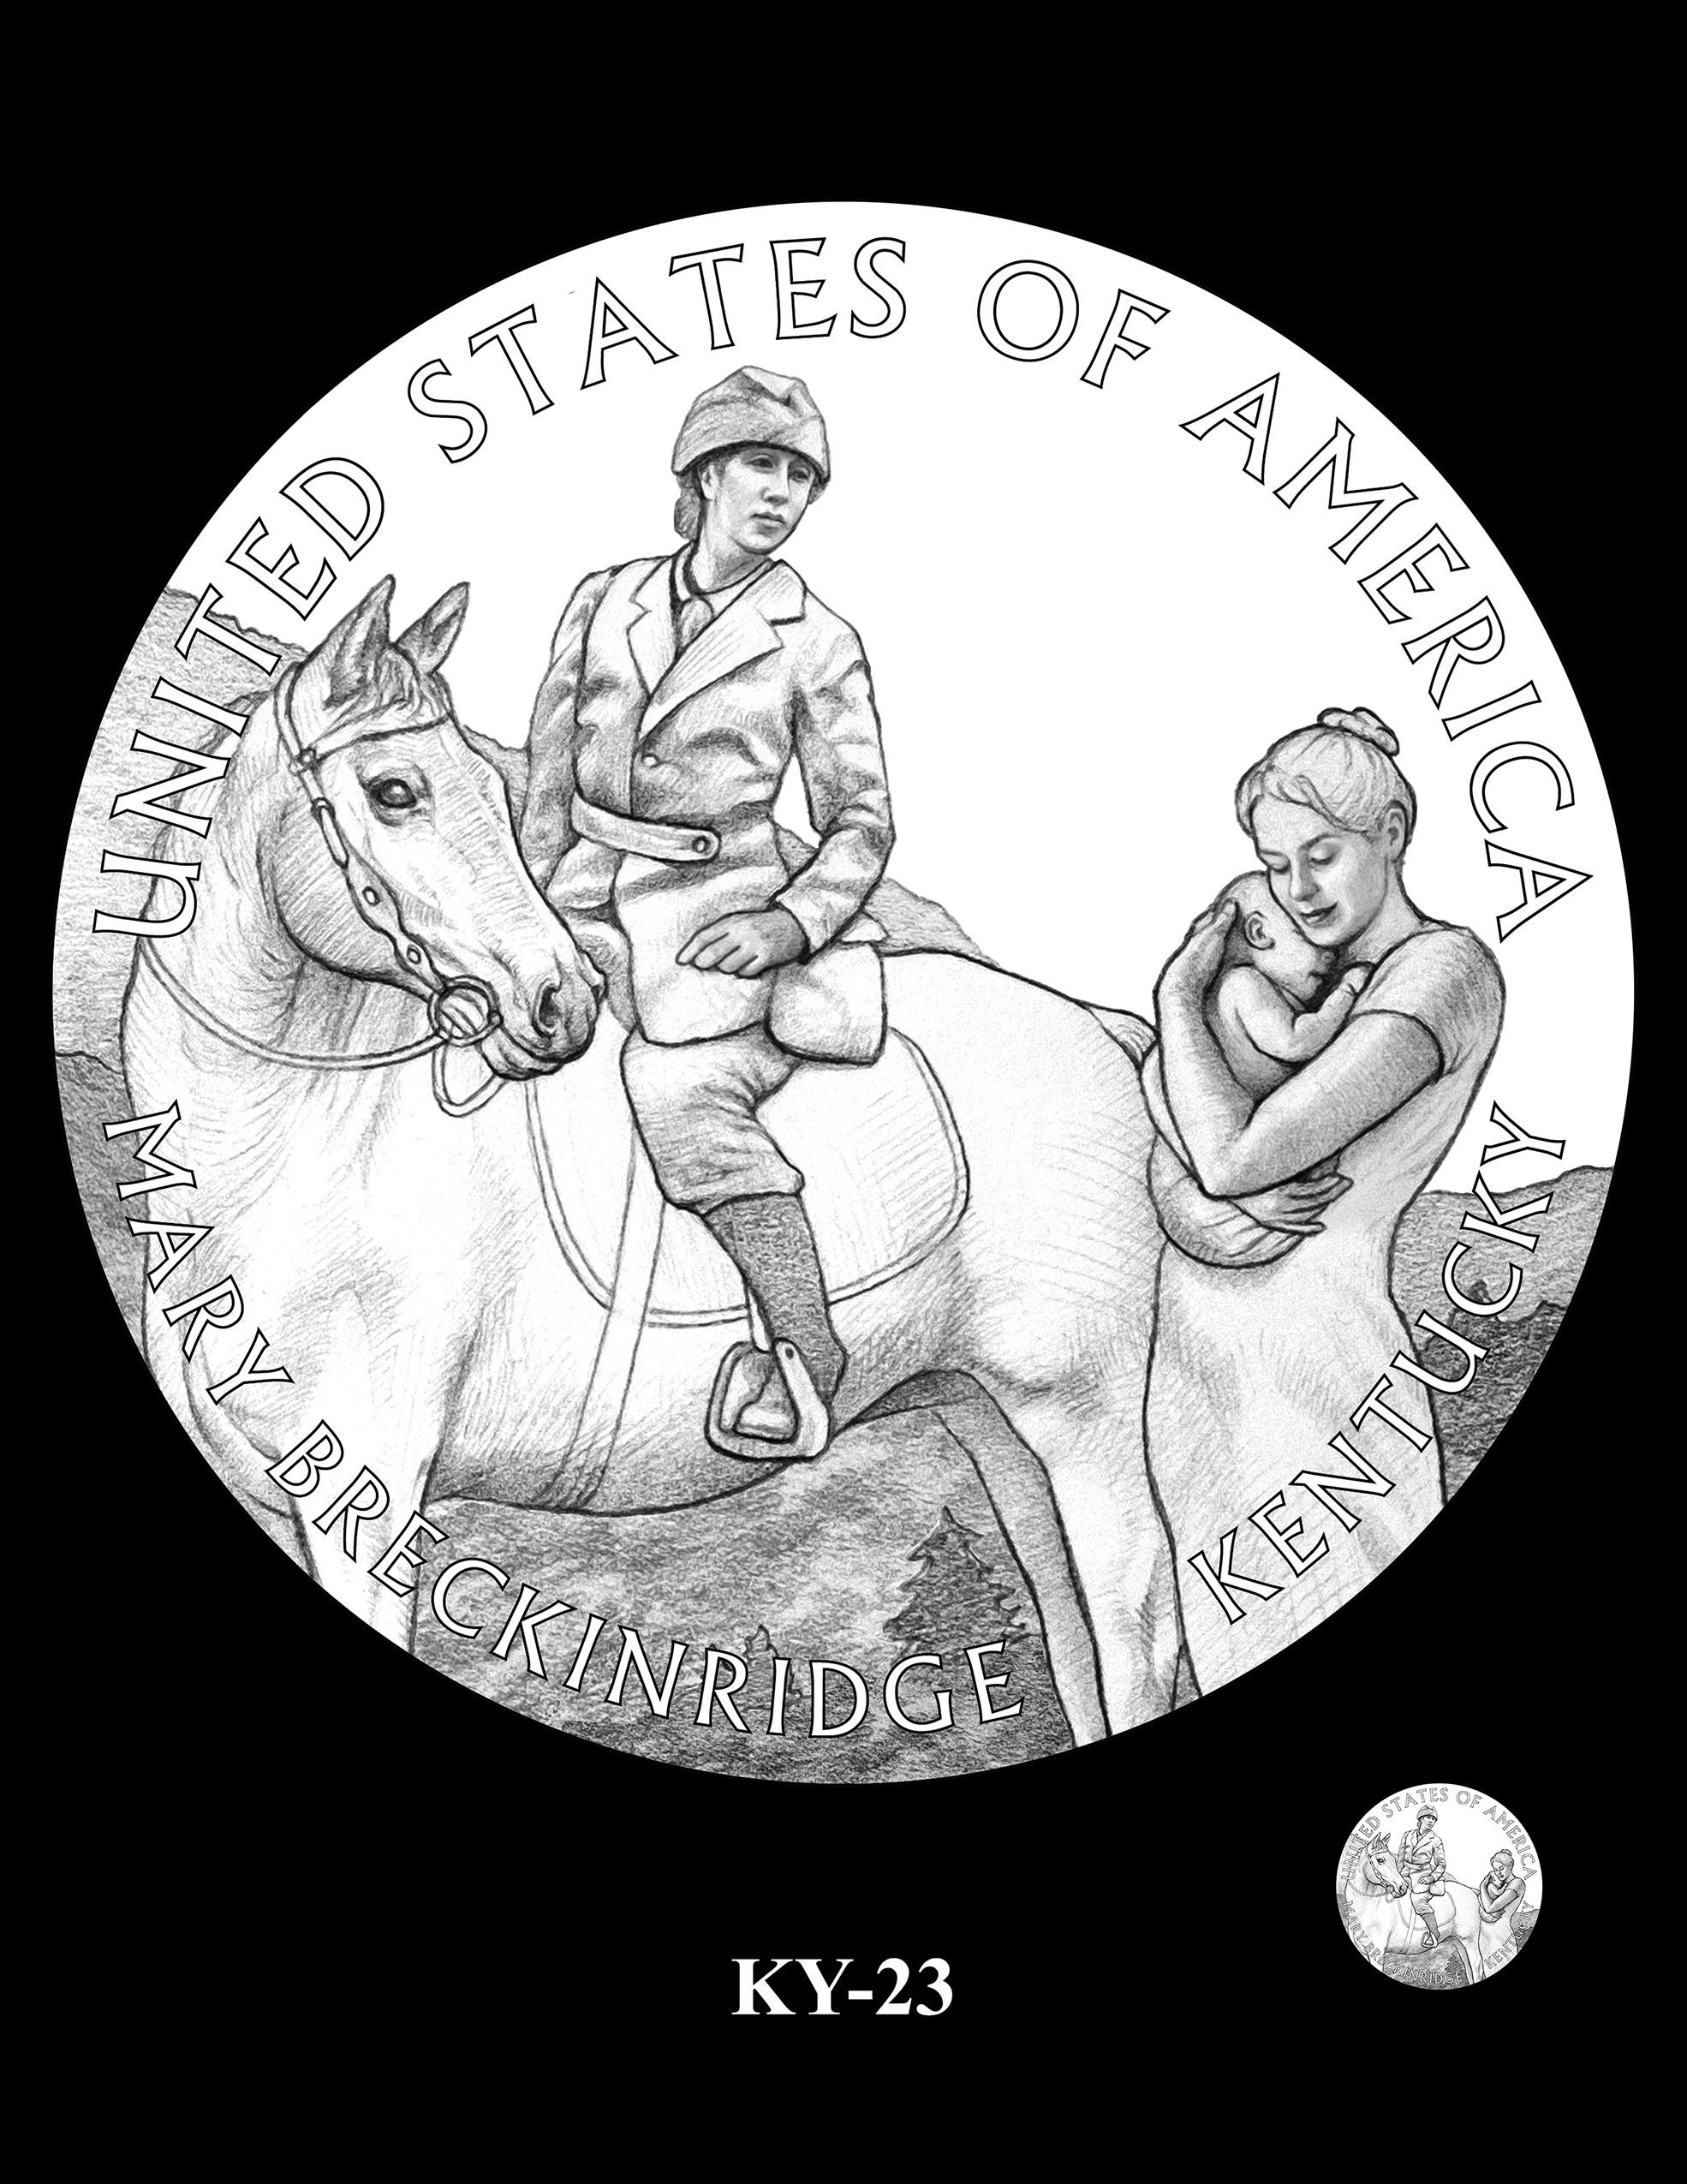 KY-23 -- 2022 American Innovation $1 Coin - Kentucky